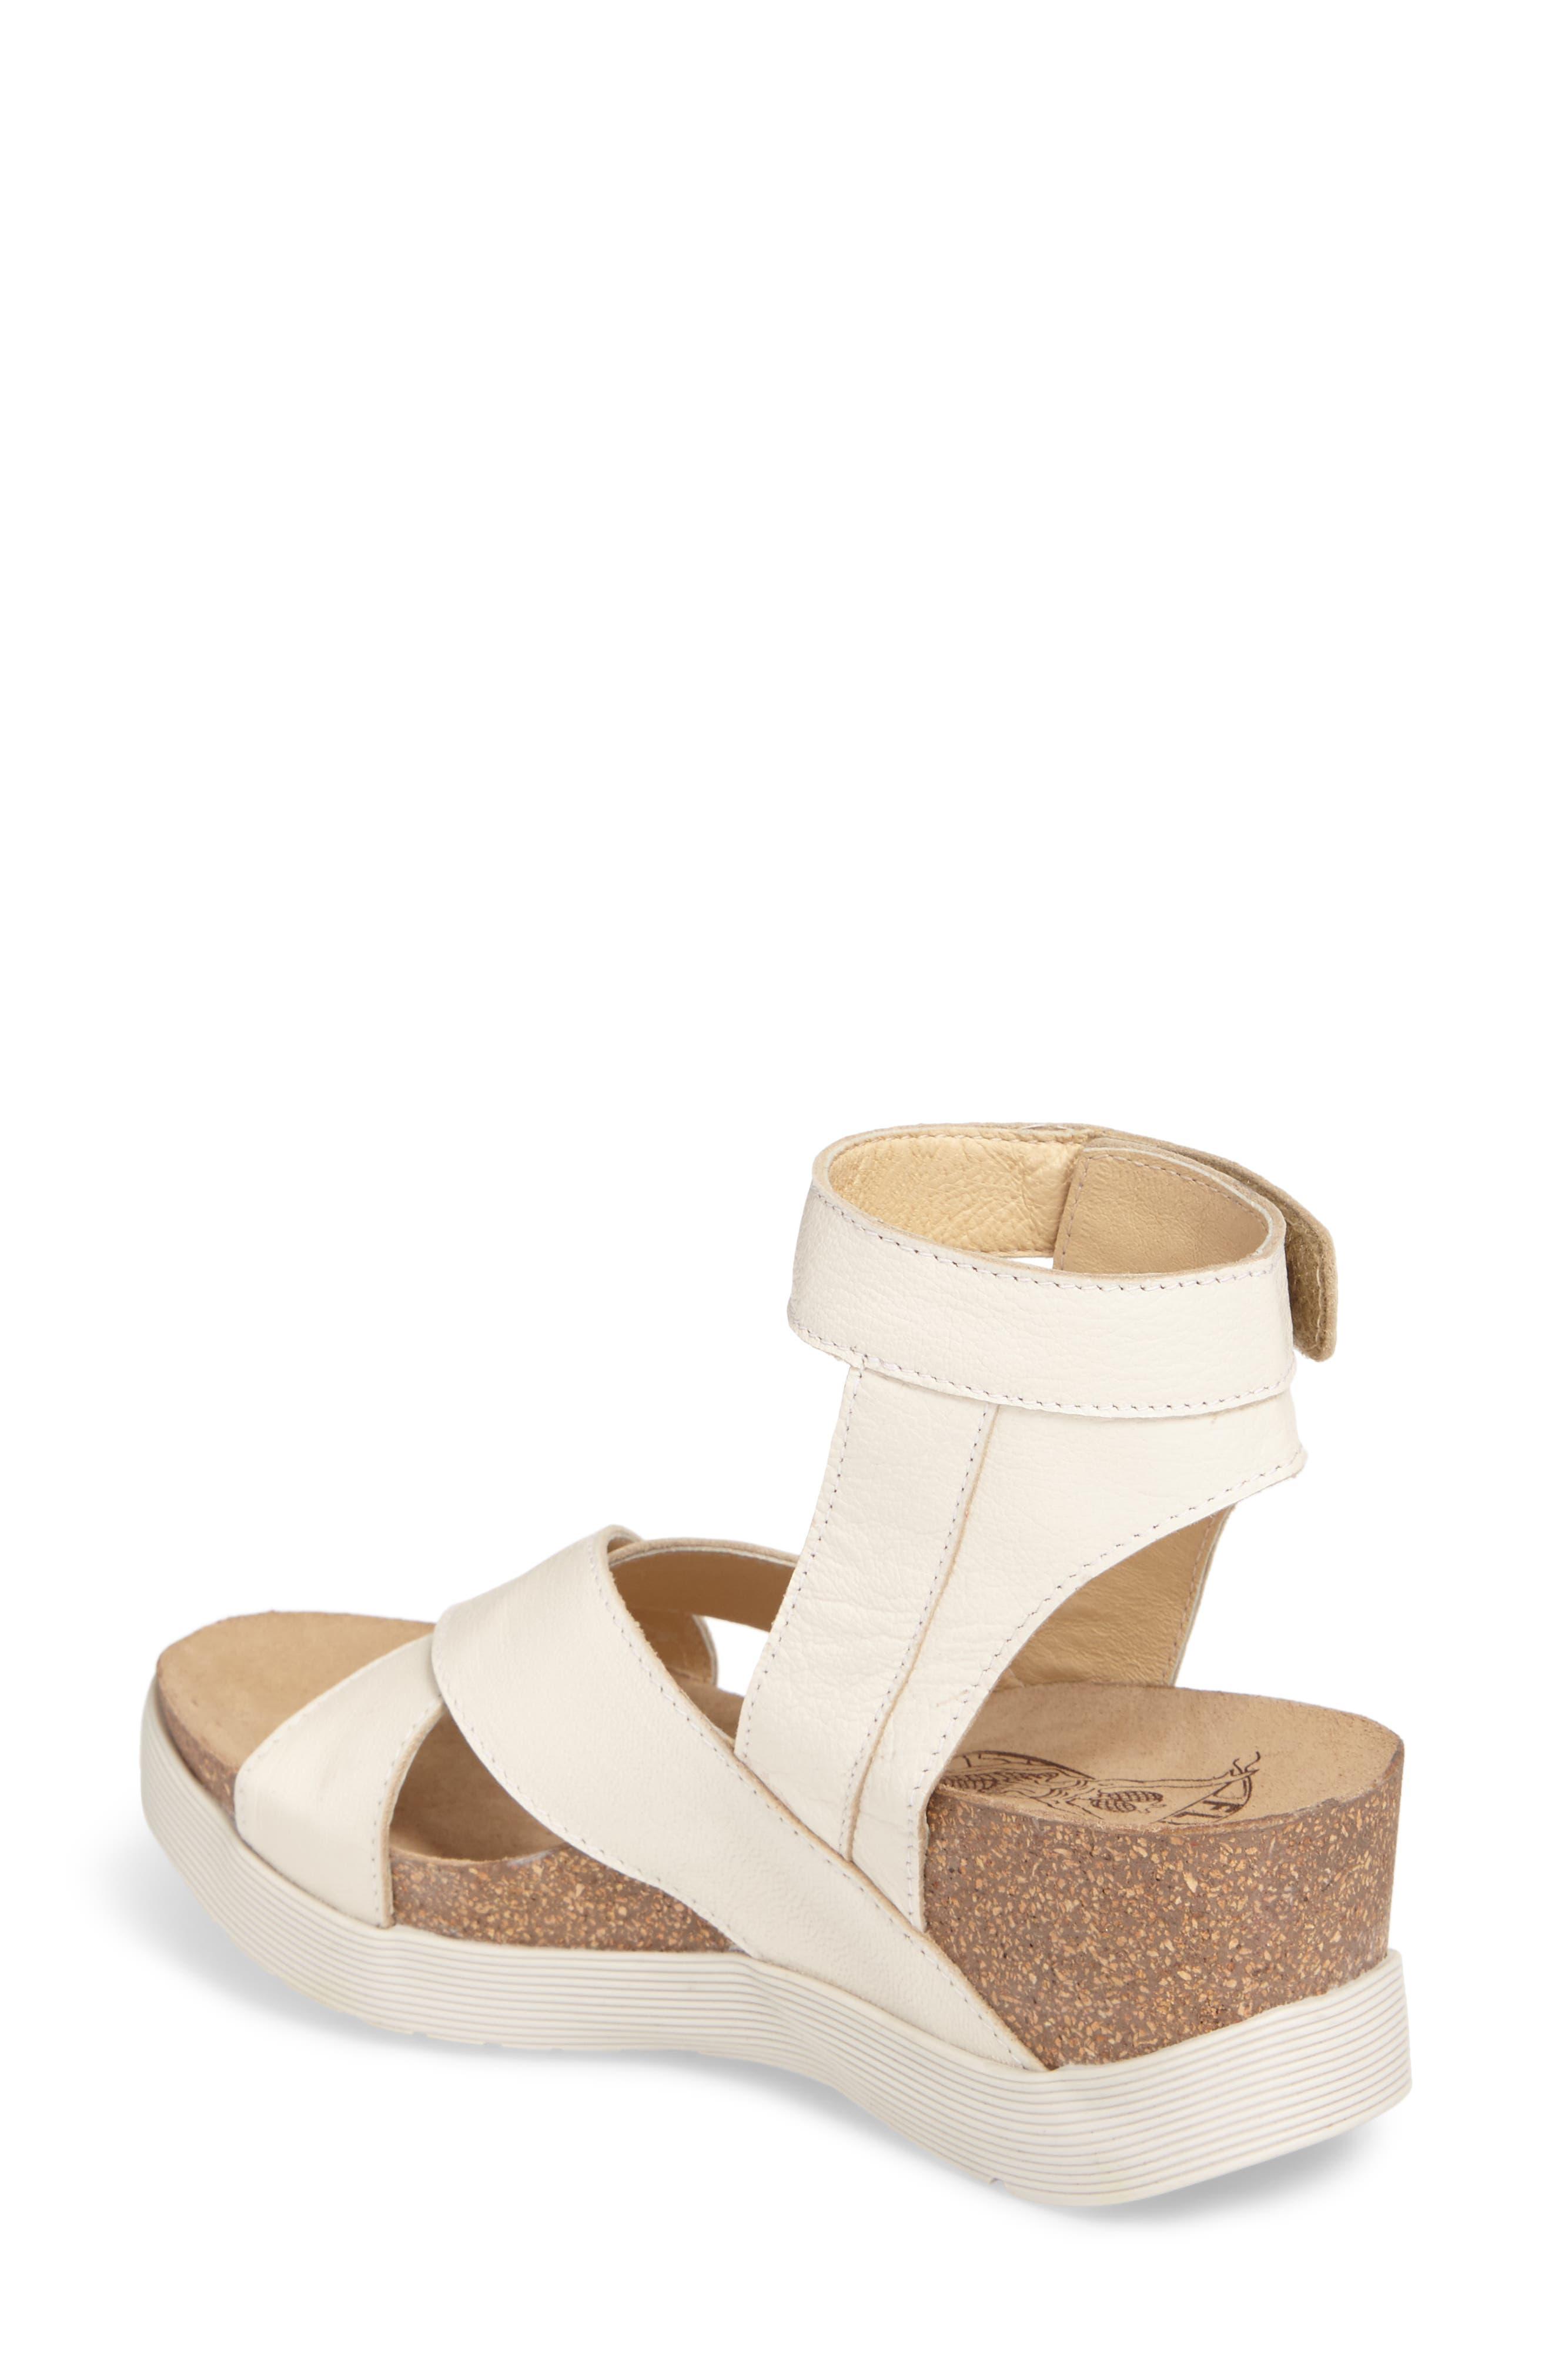 Alternate Image 2  - Fly London Weel Nubuck Leather Platform Sandal (Women)